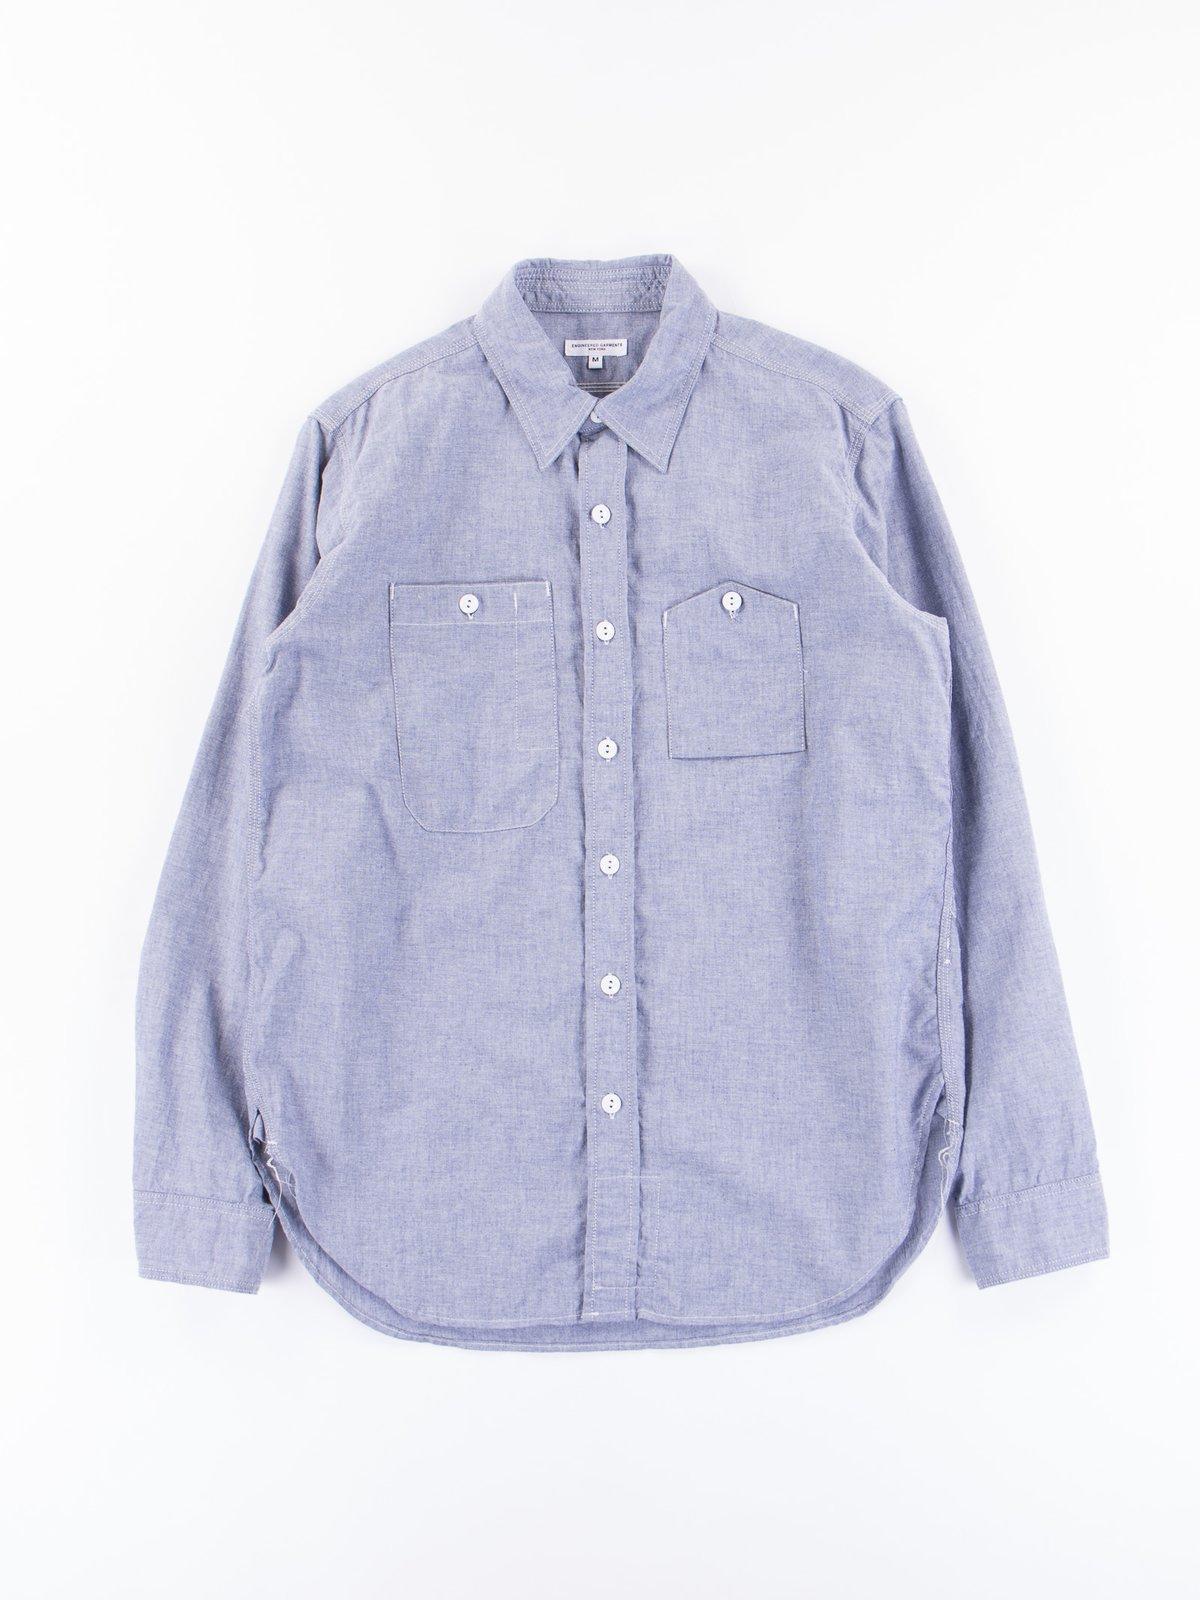 Light Blue Light Weight Cotton Chambray Work Shirt - Image 1